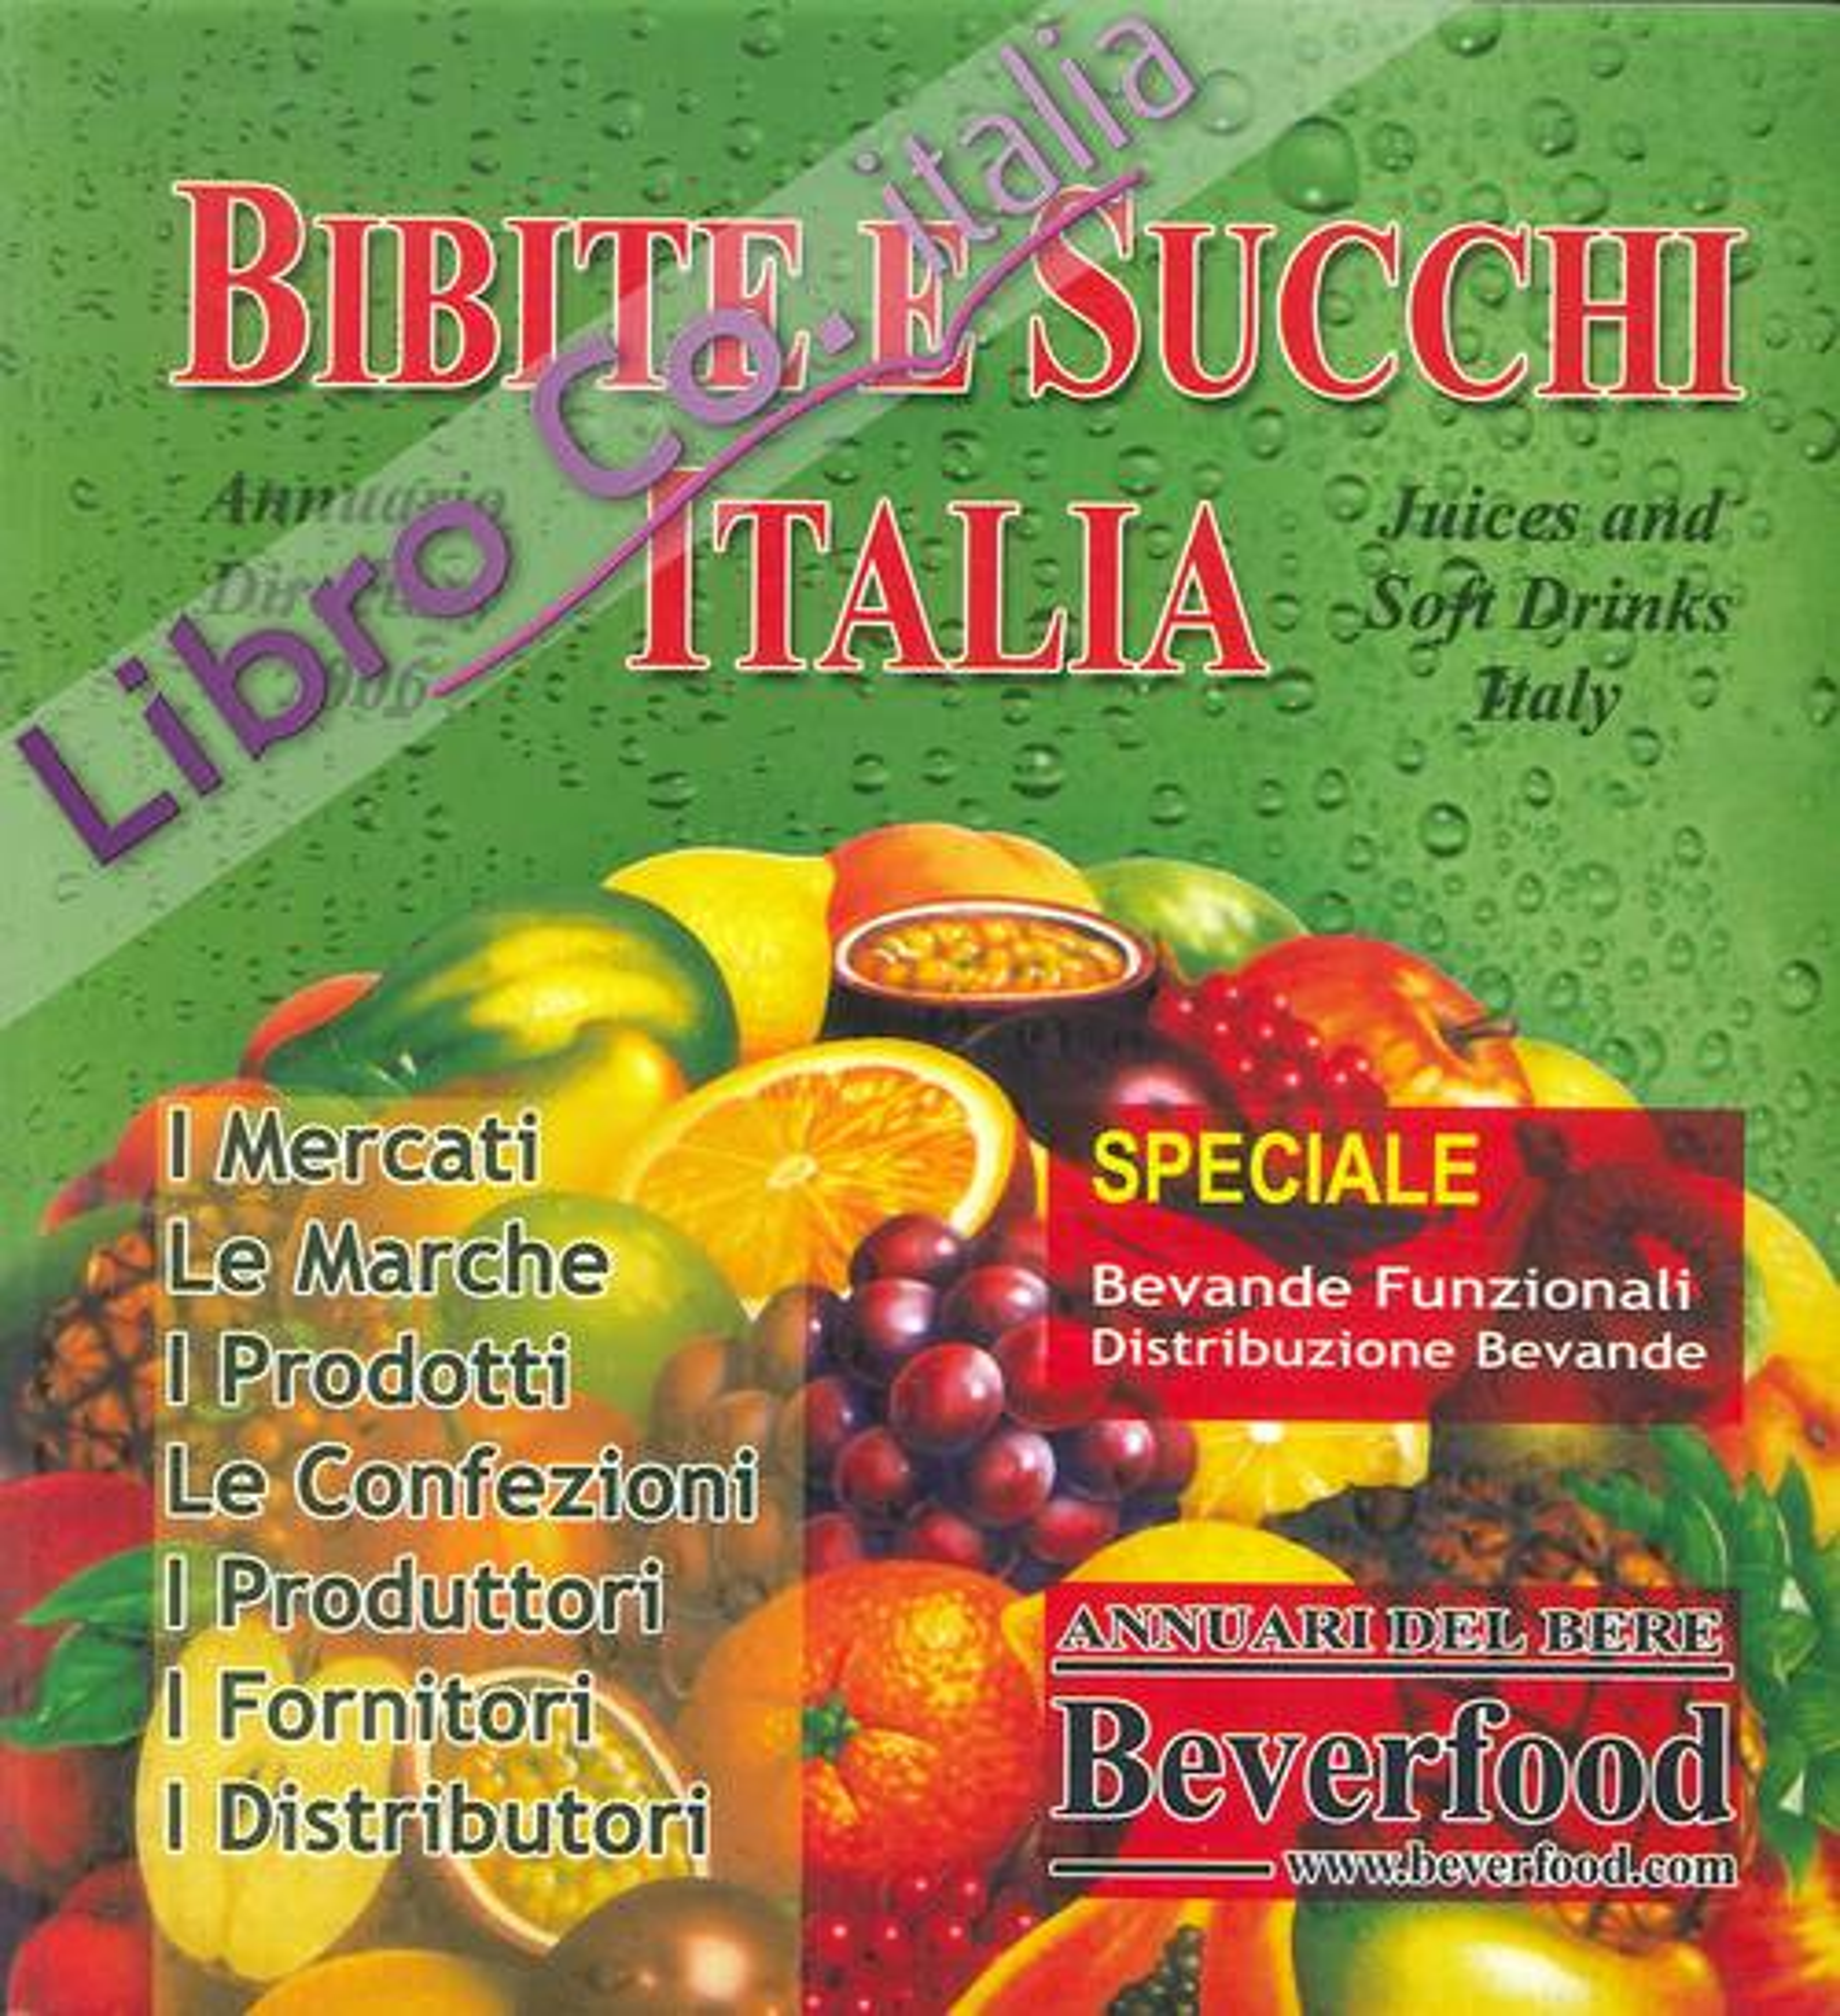 Bibite e Succhi Italia 2006. Annuario Directory 2006. Juices and Soft Drinks Italy